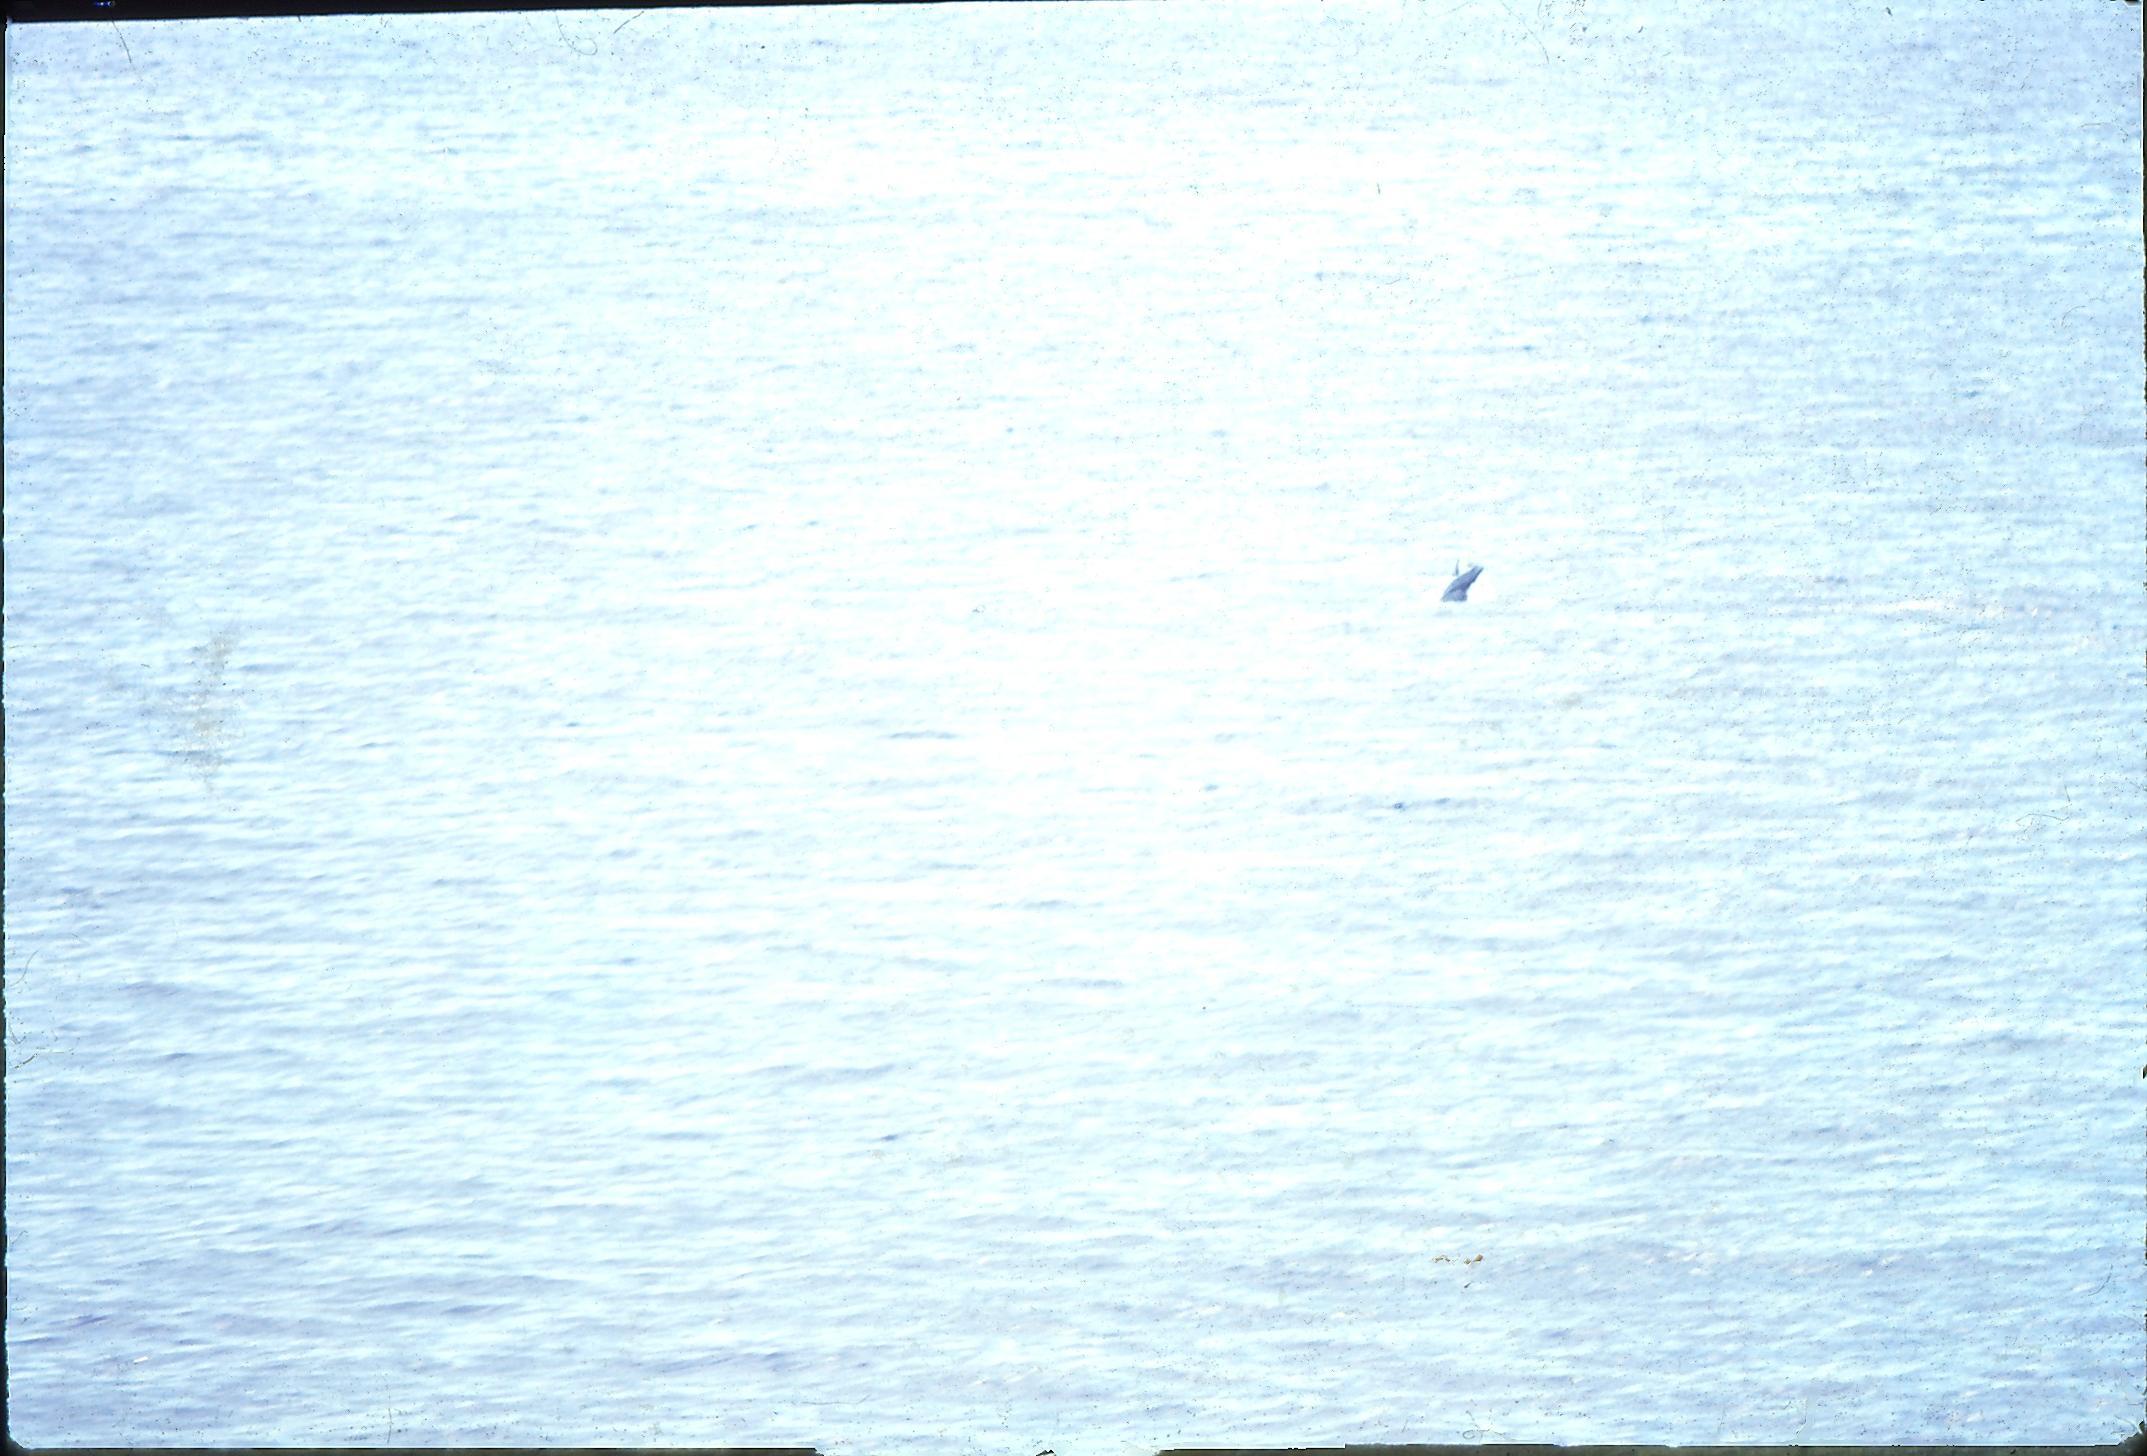 11-Dolphins-1.jpeg